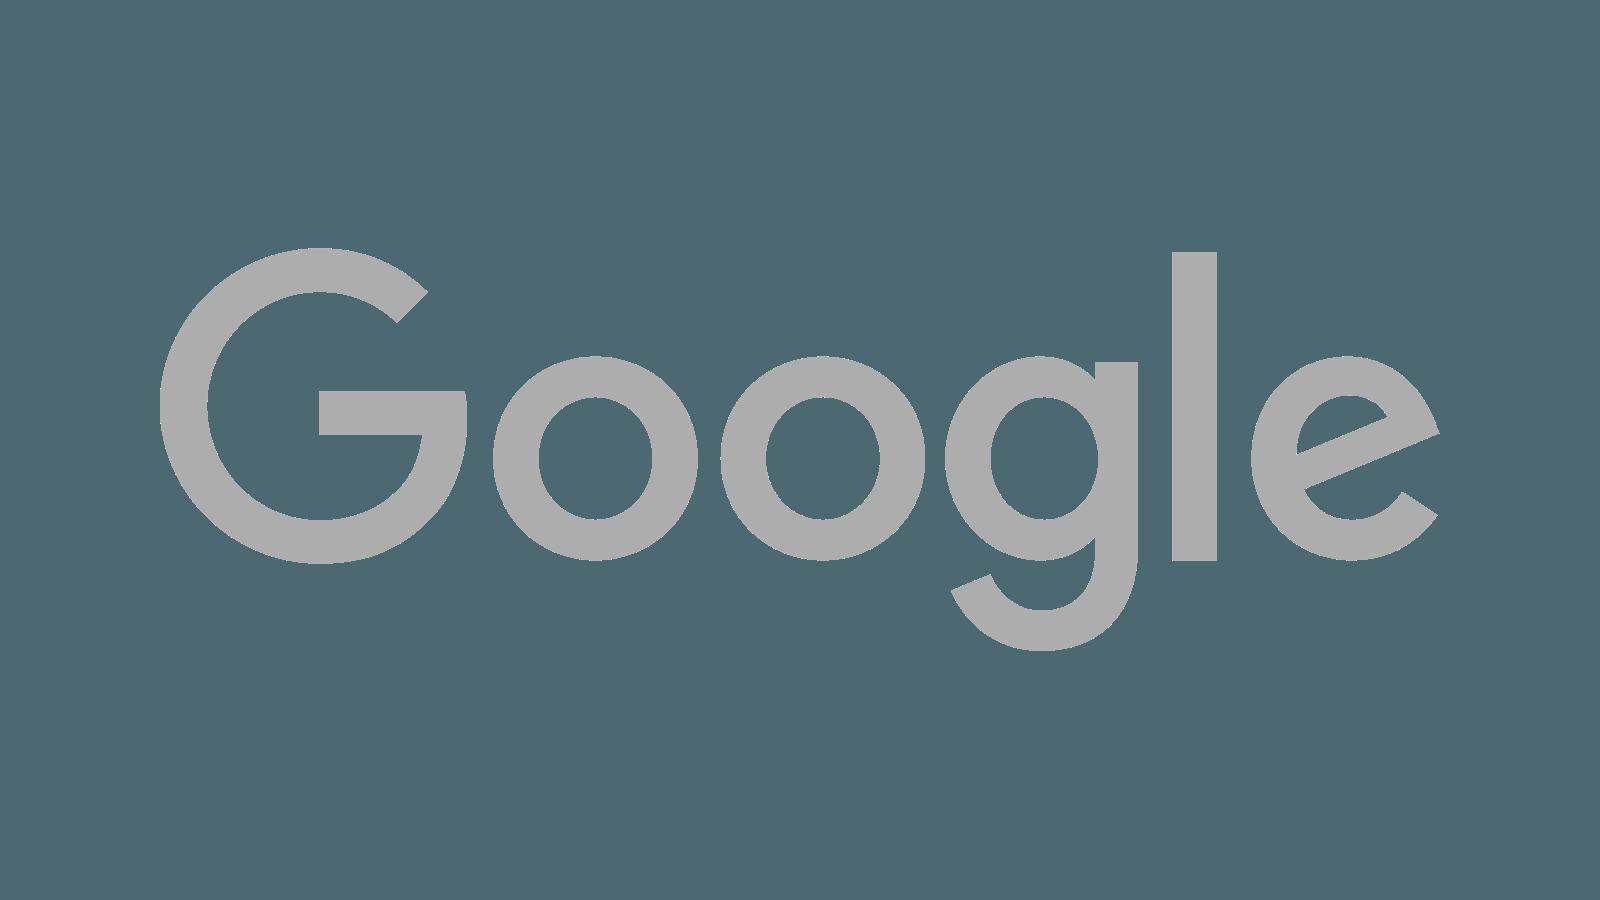 NCAA and Google documentary music by Turreekk Music